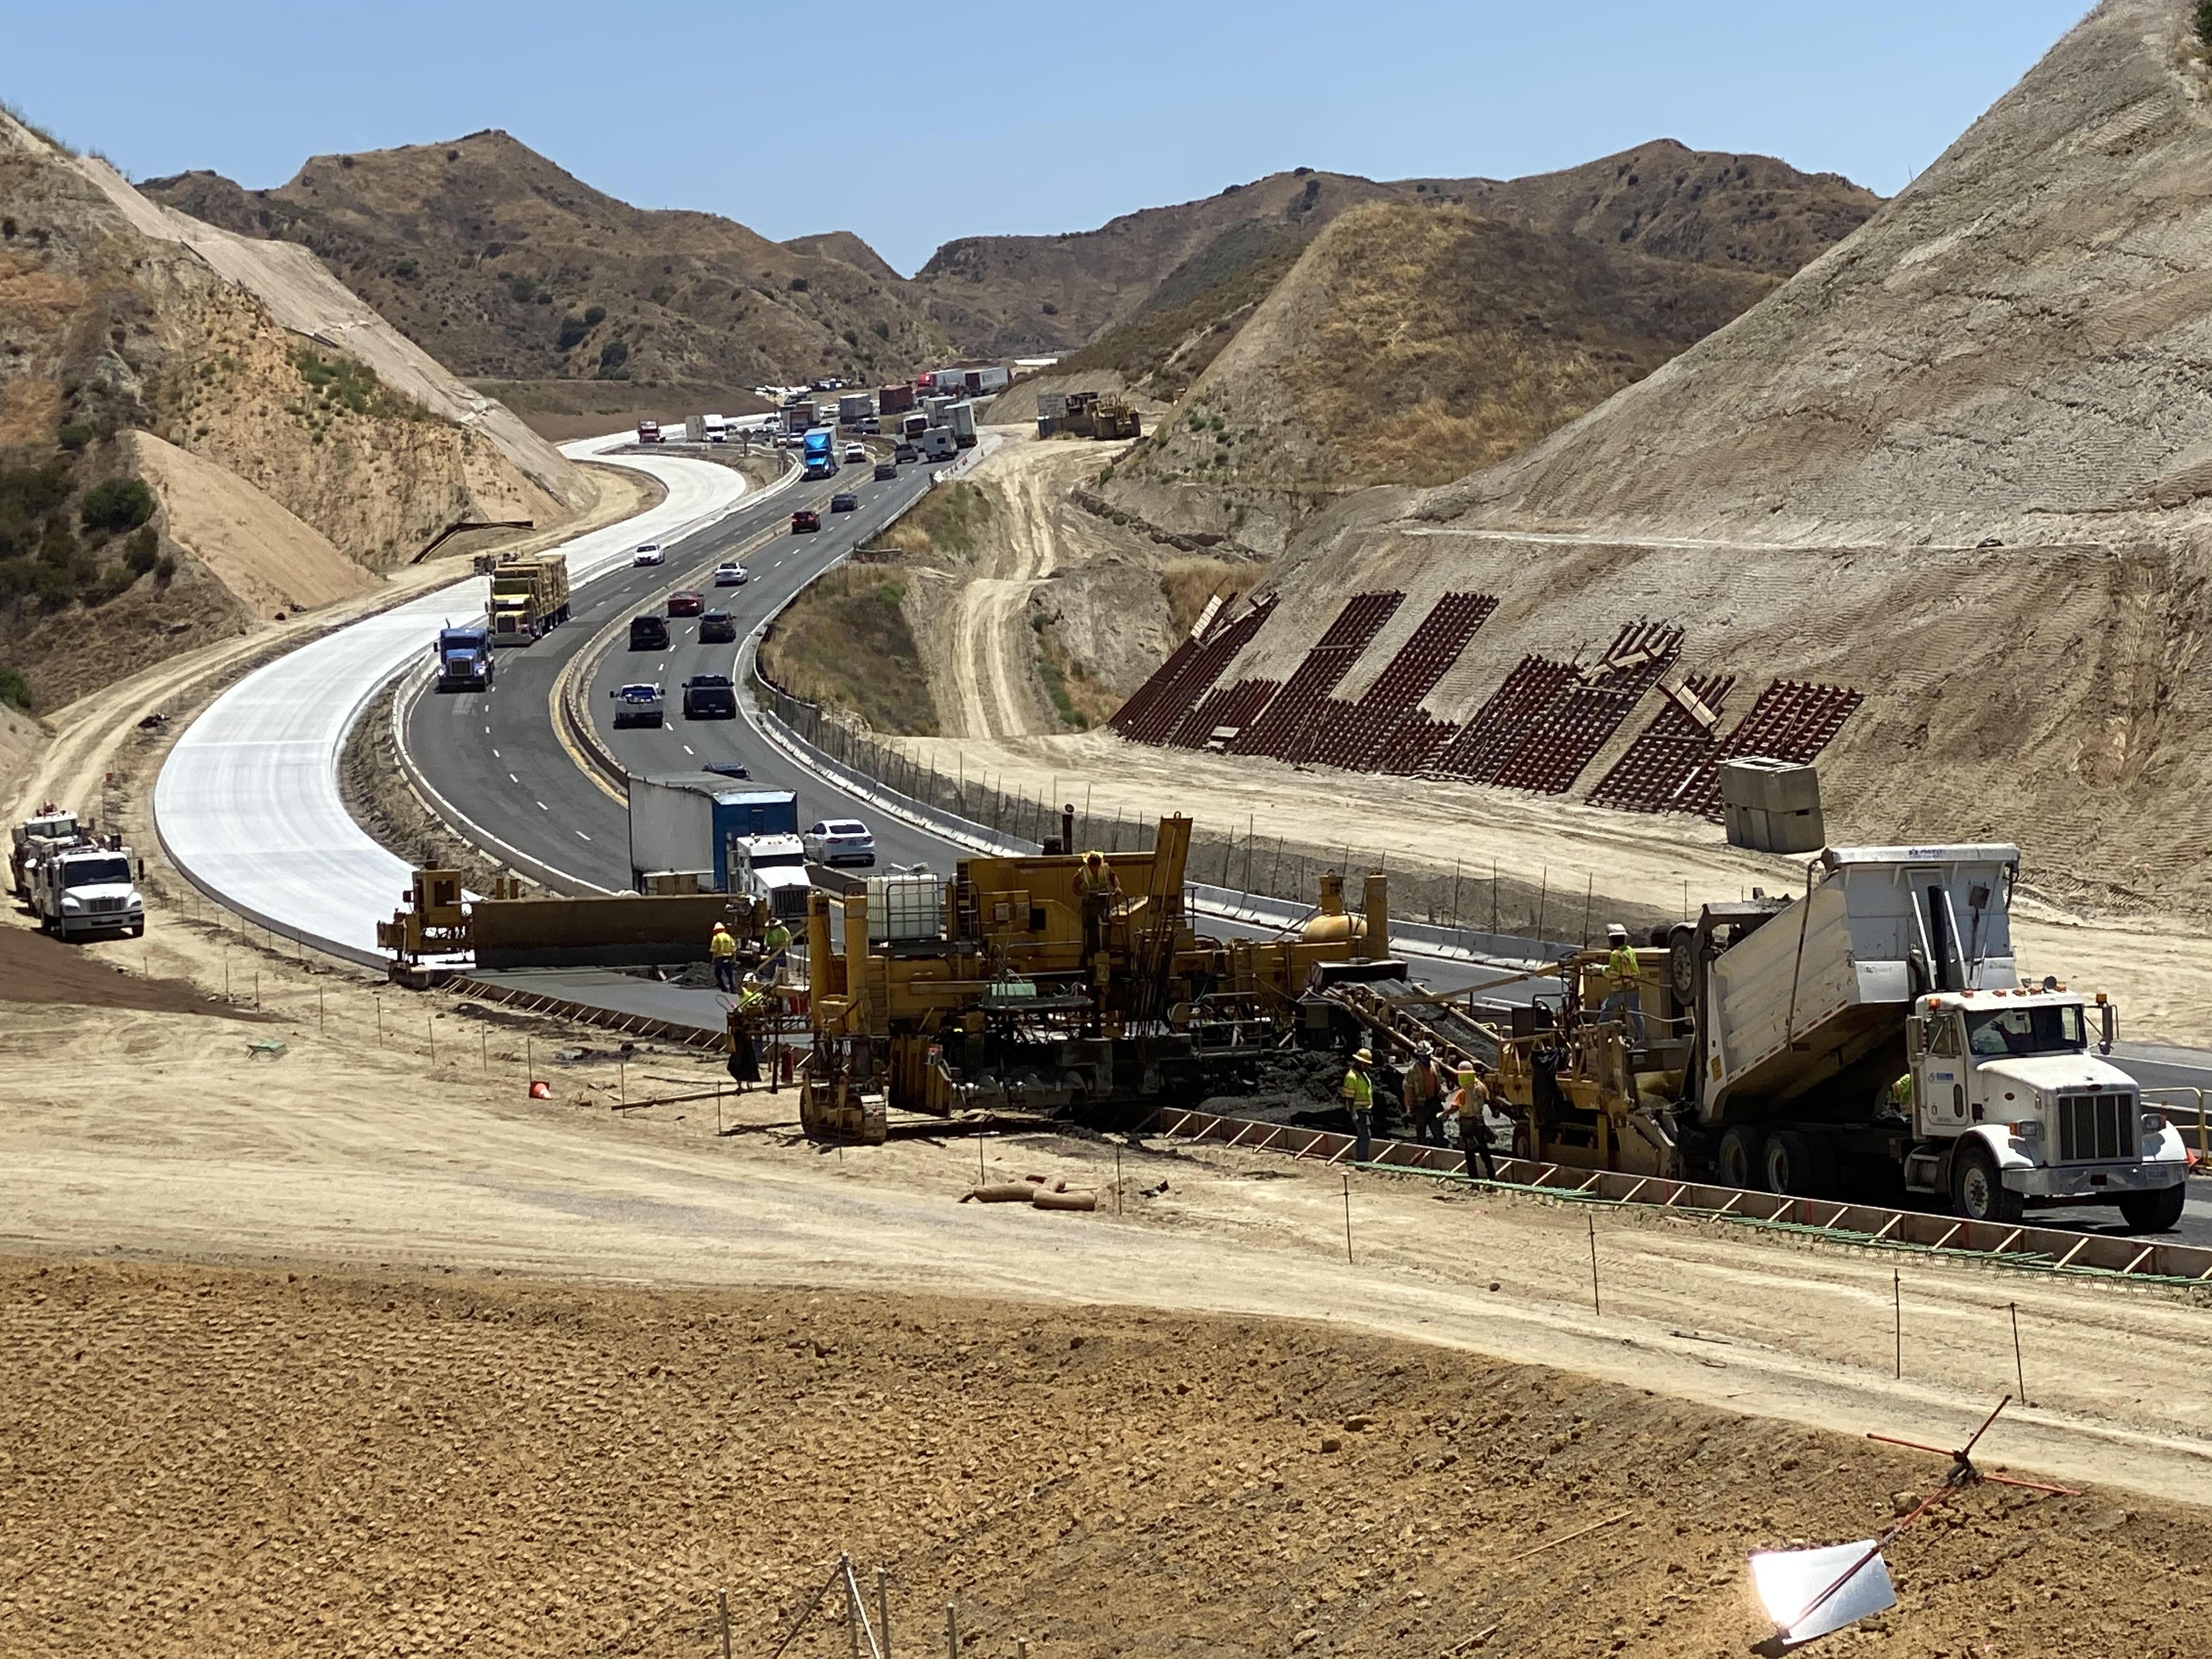 SR-60 Truck Climbing Lanes Project